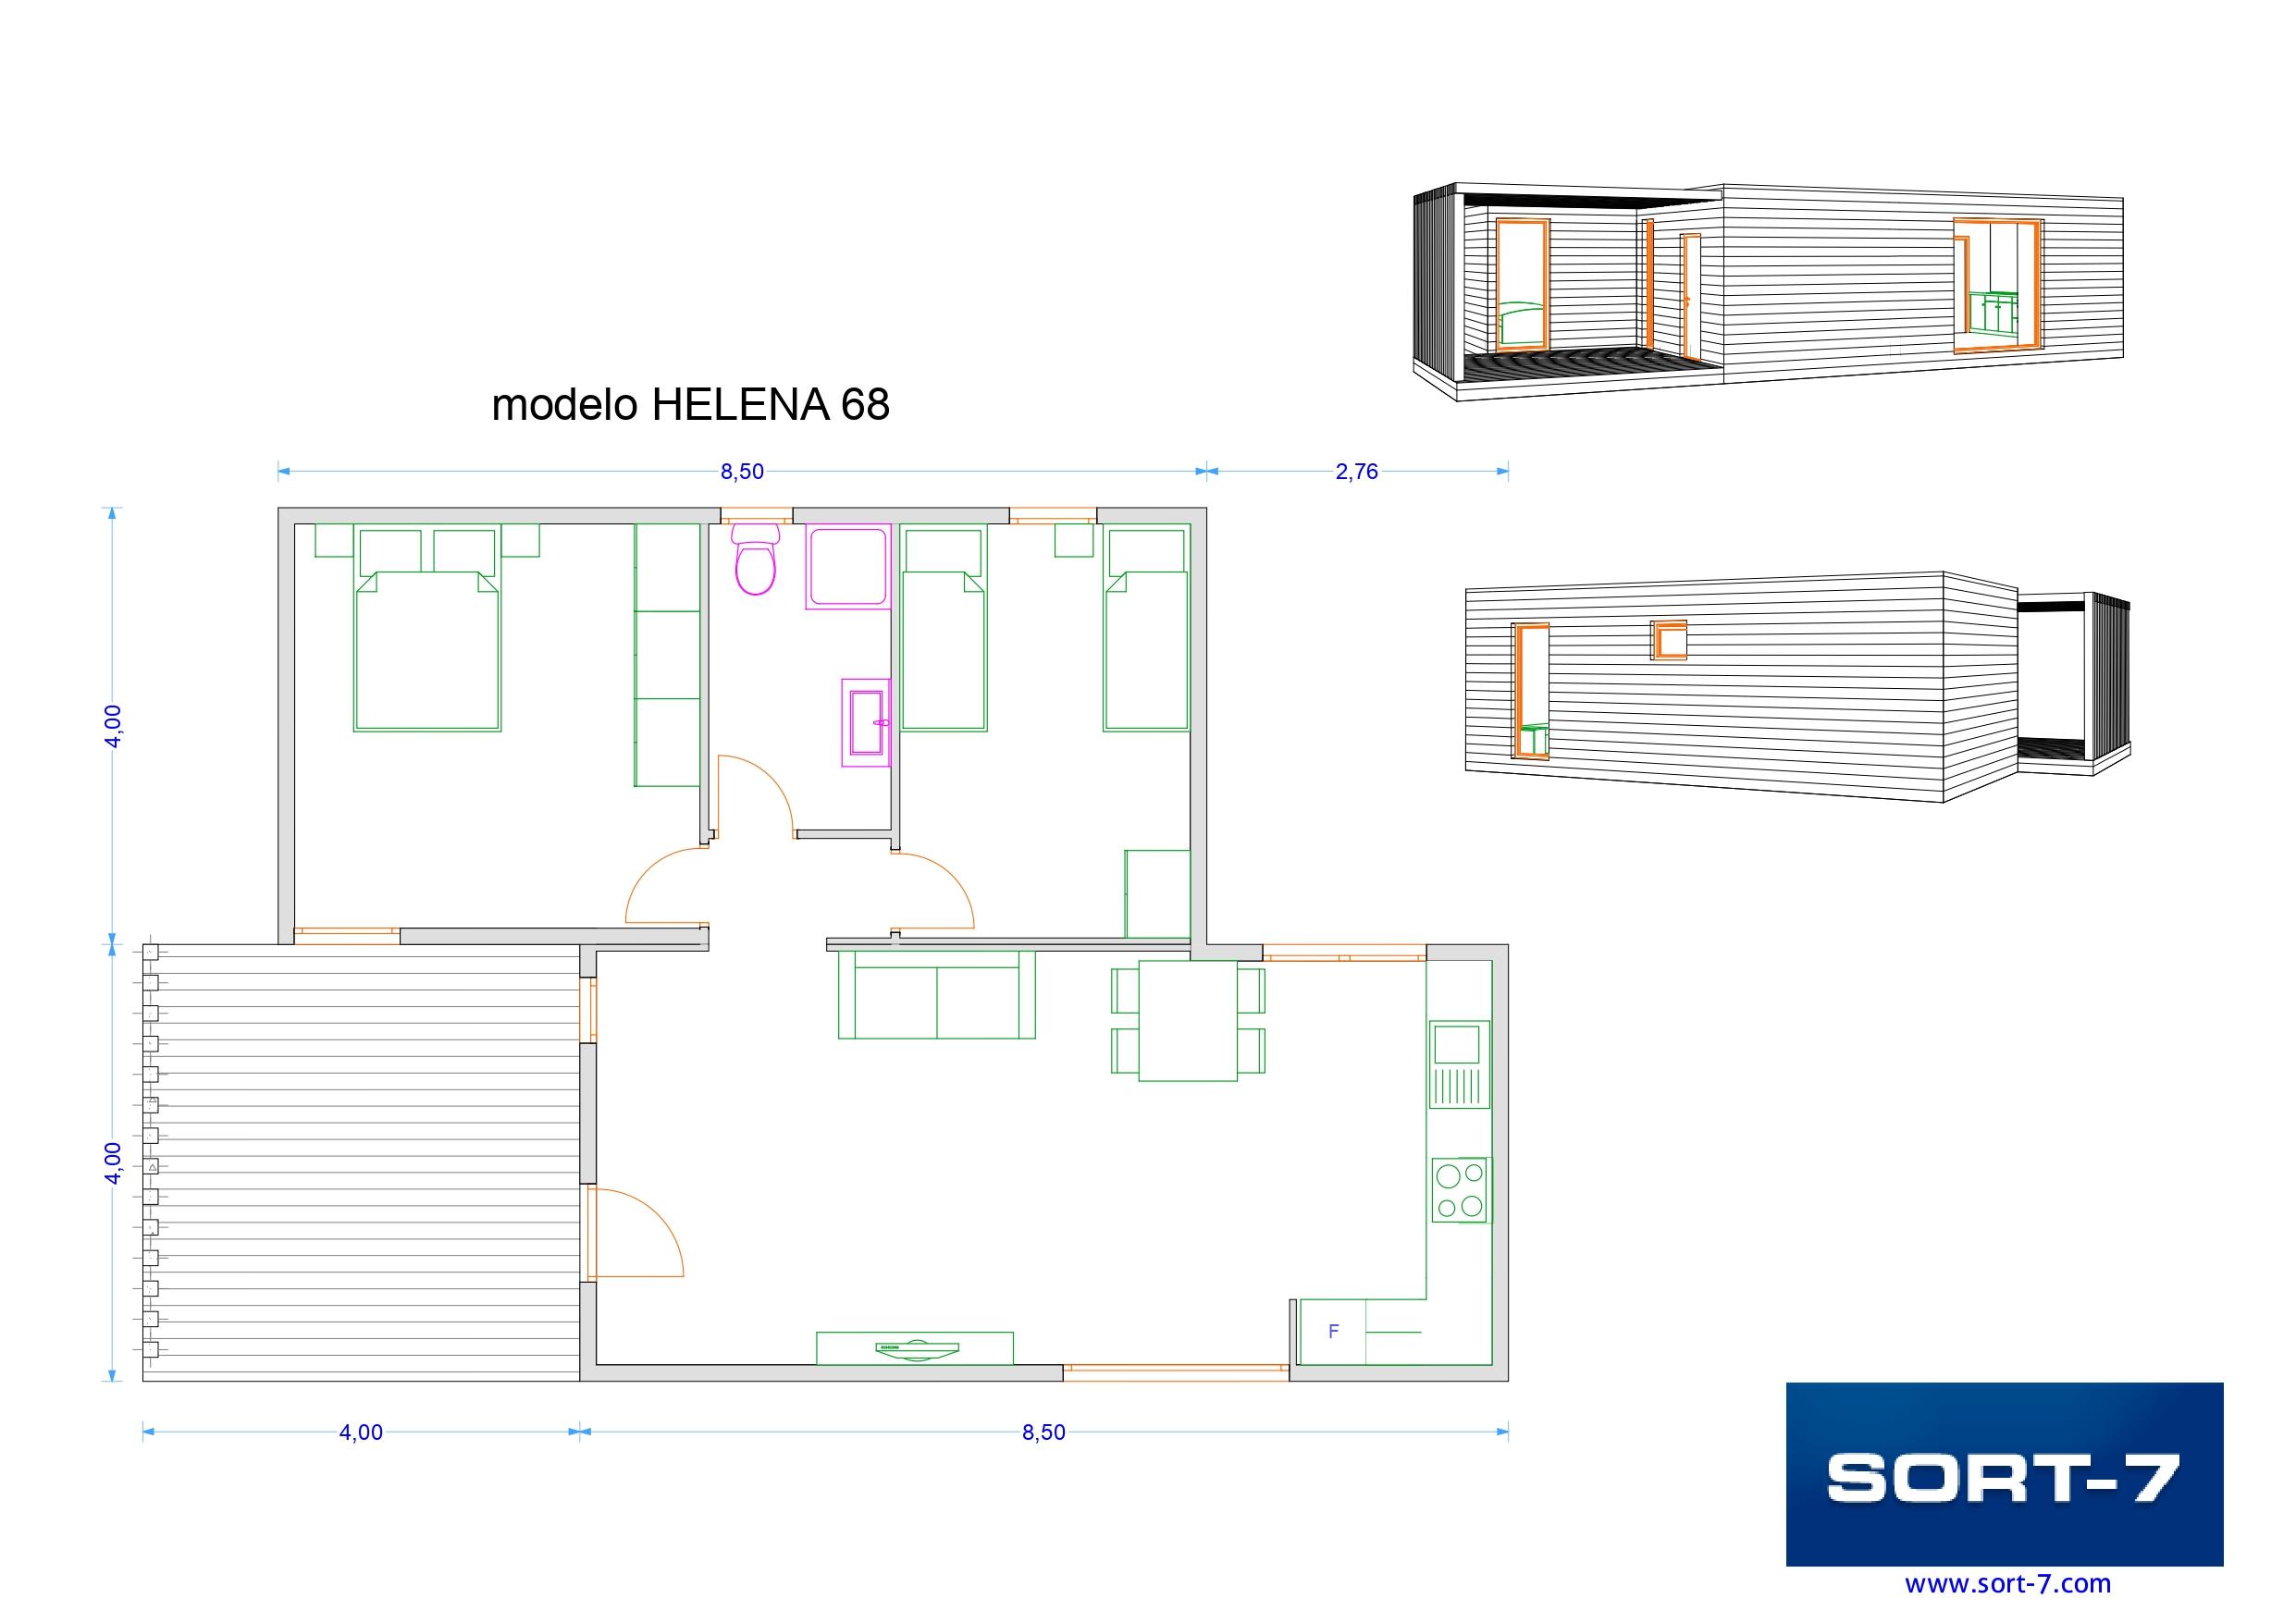 Solicitar presupuesto: Modelo 68m² Helena - 4e279-ebd70-68-HELENA-vistas4_page-0001.jpg